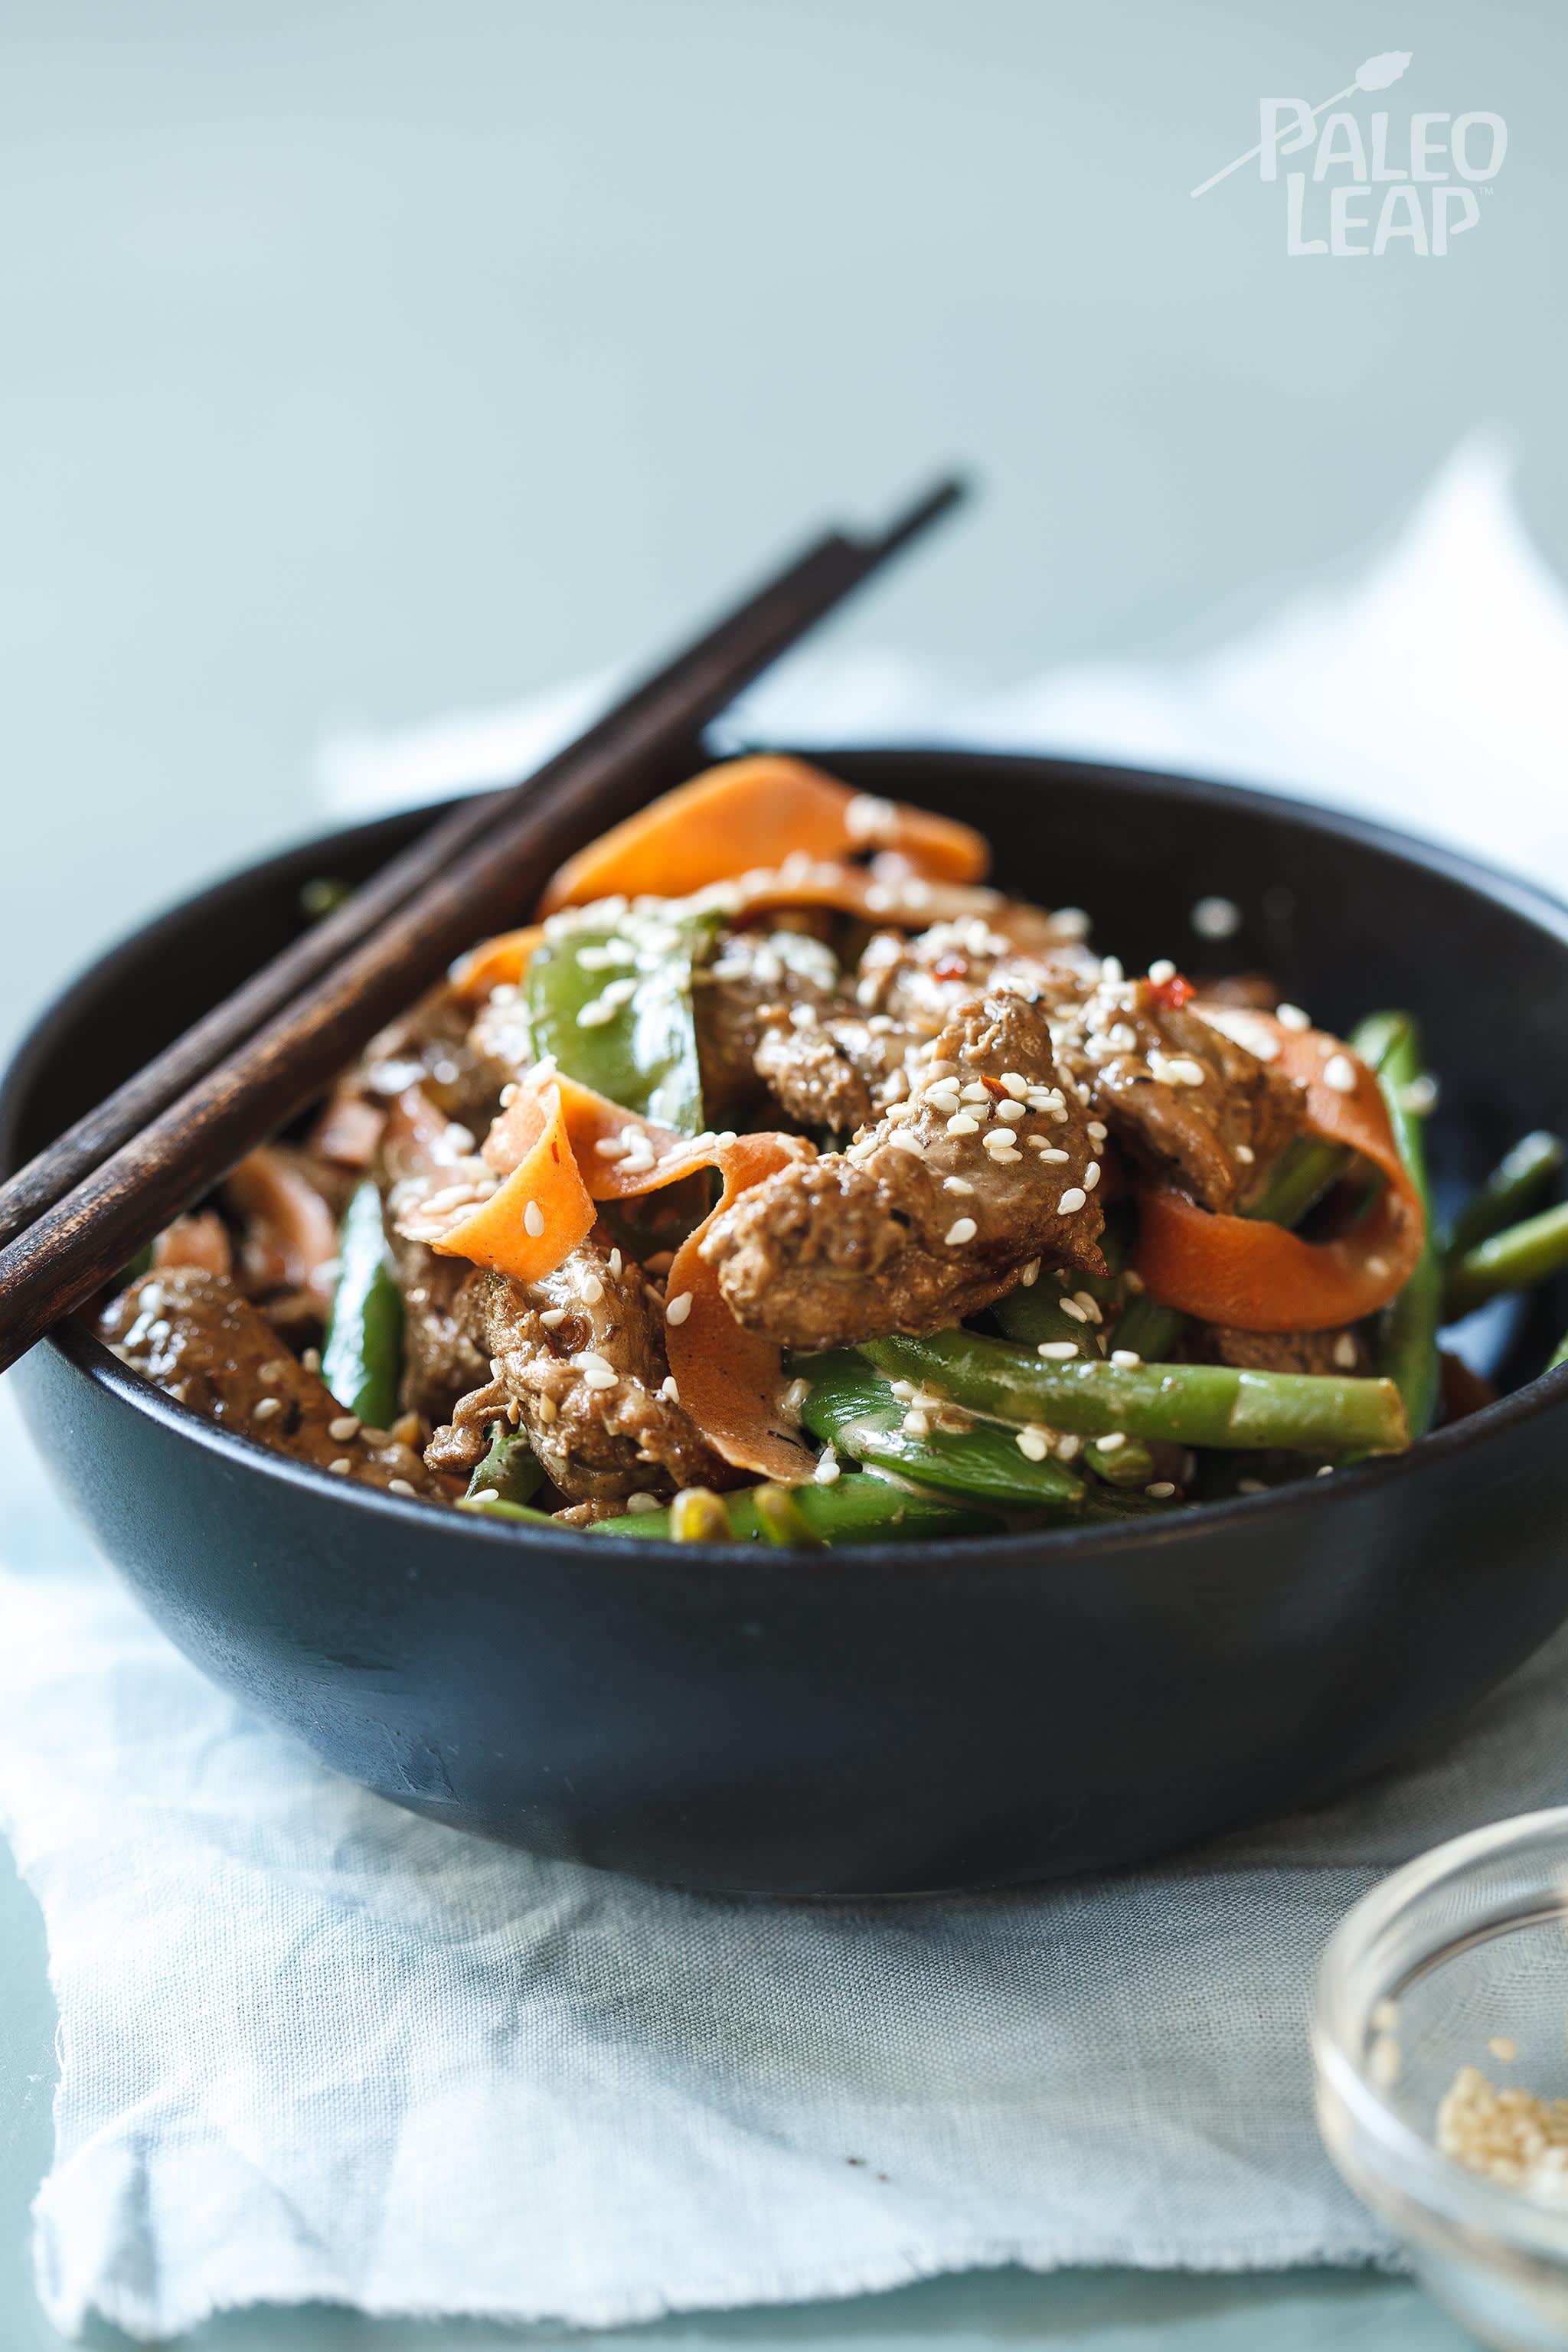 Pork And Vegetable Coconut Stir-Fry